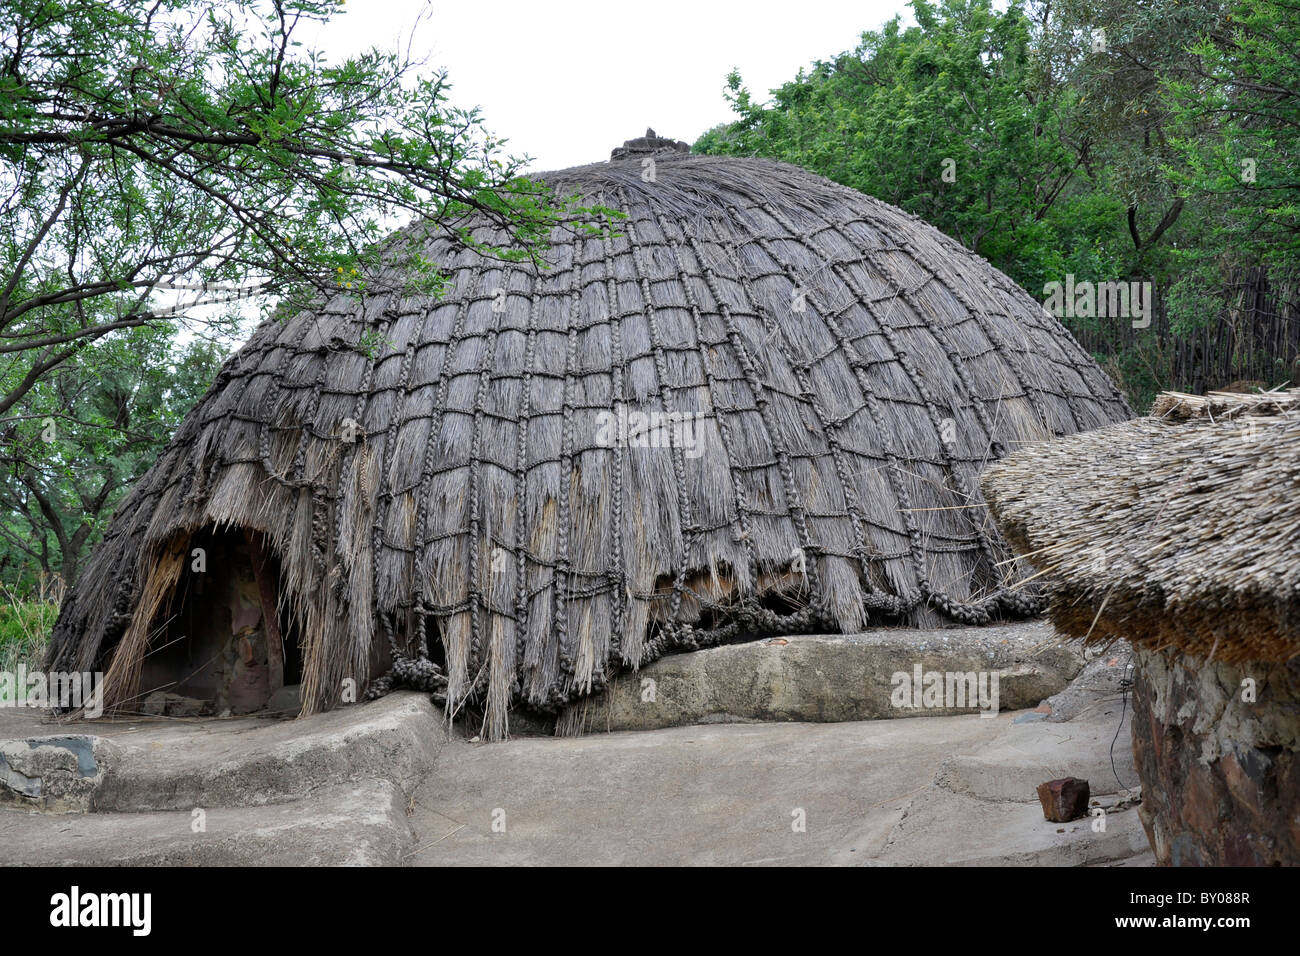 Credo Mutwa Cultural Village, Soweto, Johannesburg, South Africa Stock Photo